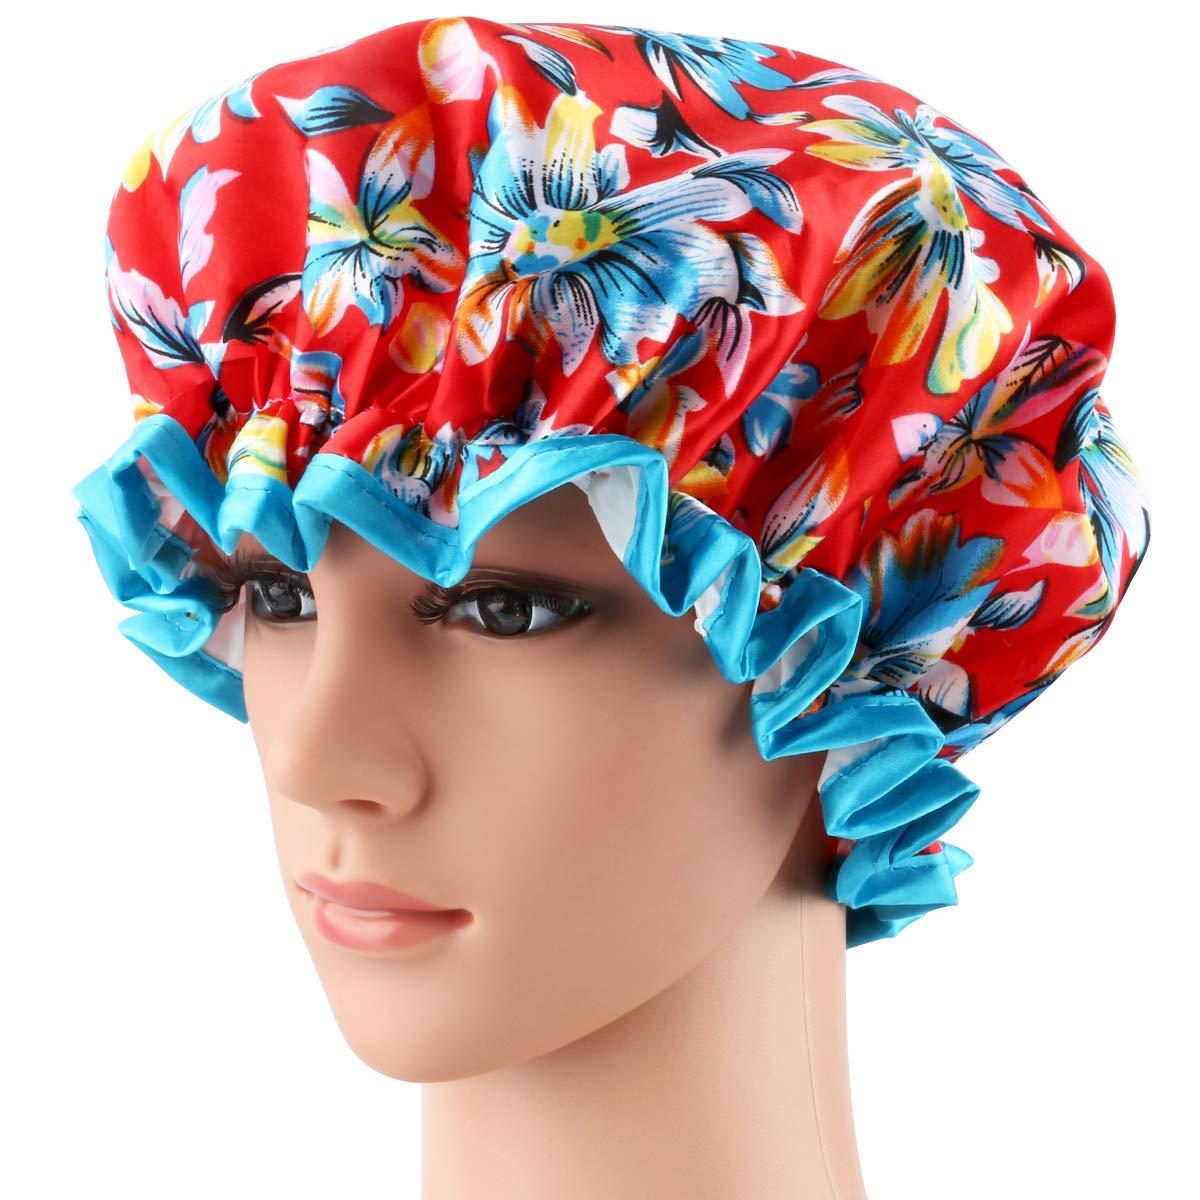 Shower Cap, ESARORA 4 PACK Bath Cap Designed for Women Waterproof Double Layer : Beauty